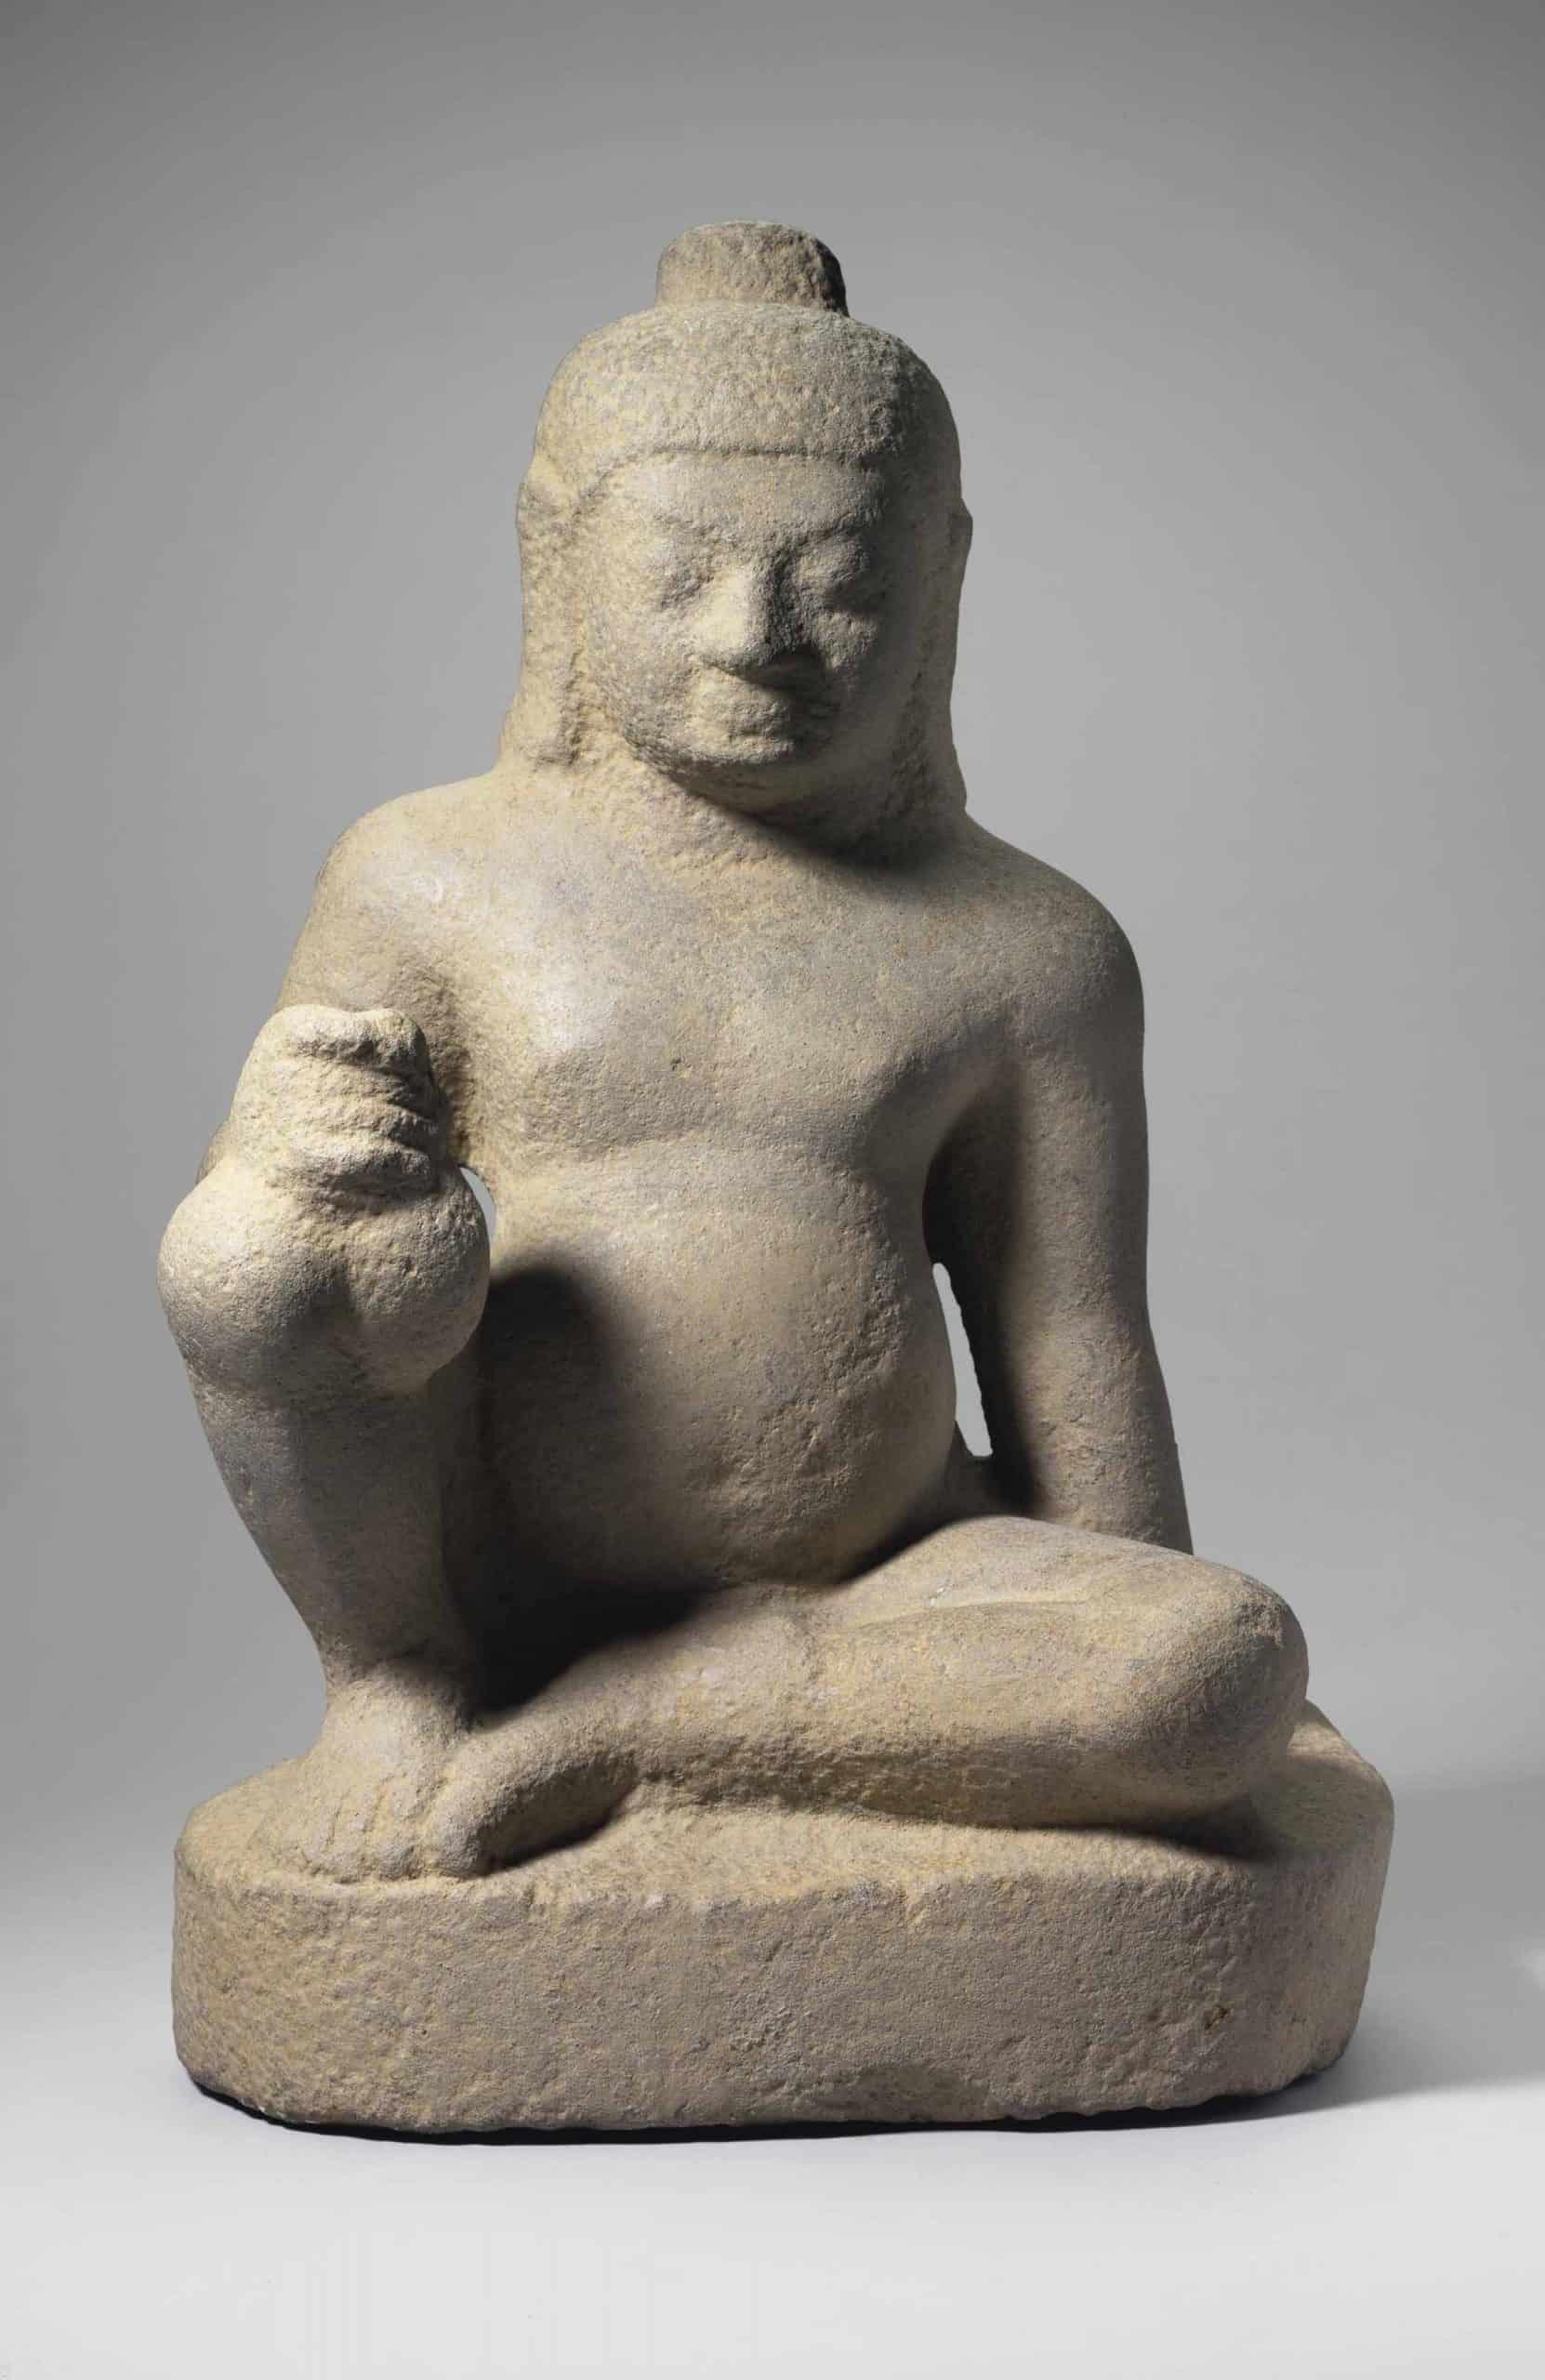 A buff sandstone Figure of Kubera - Oc eo culture relics